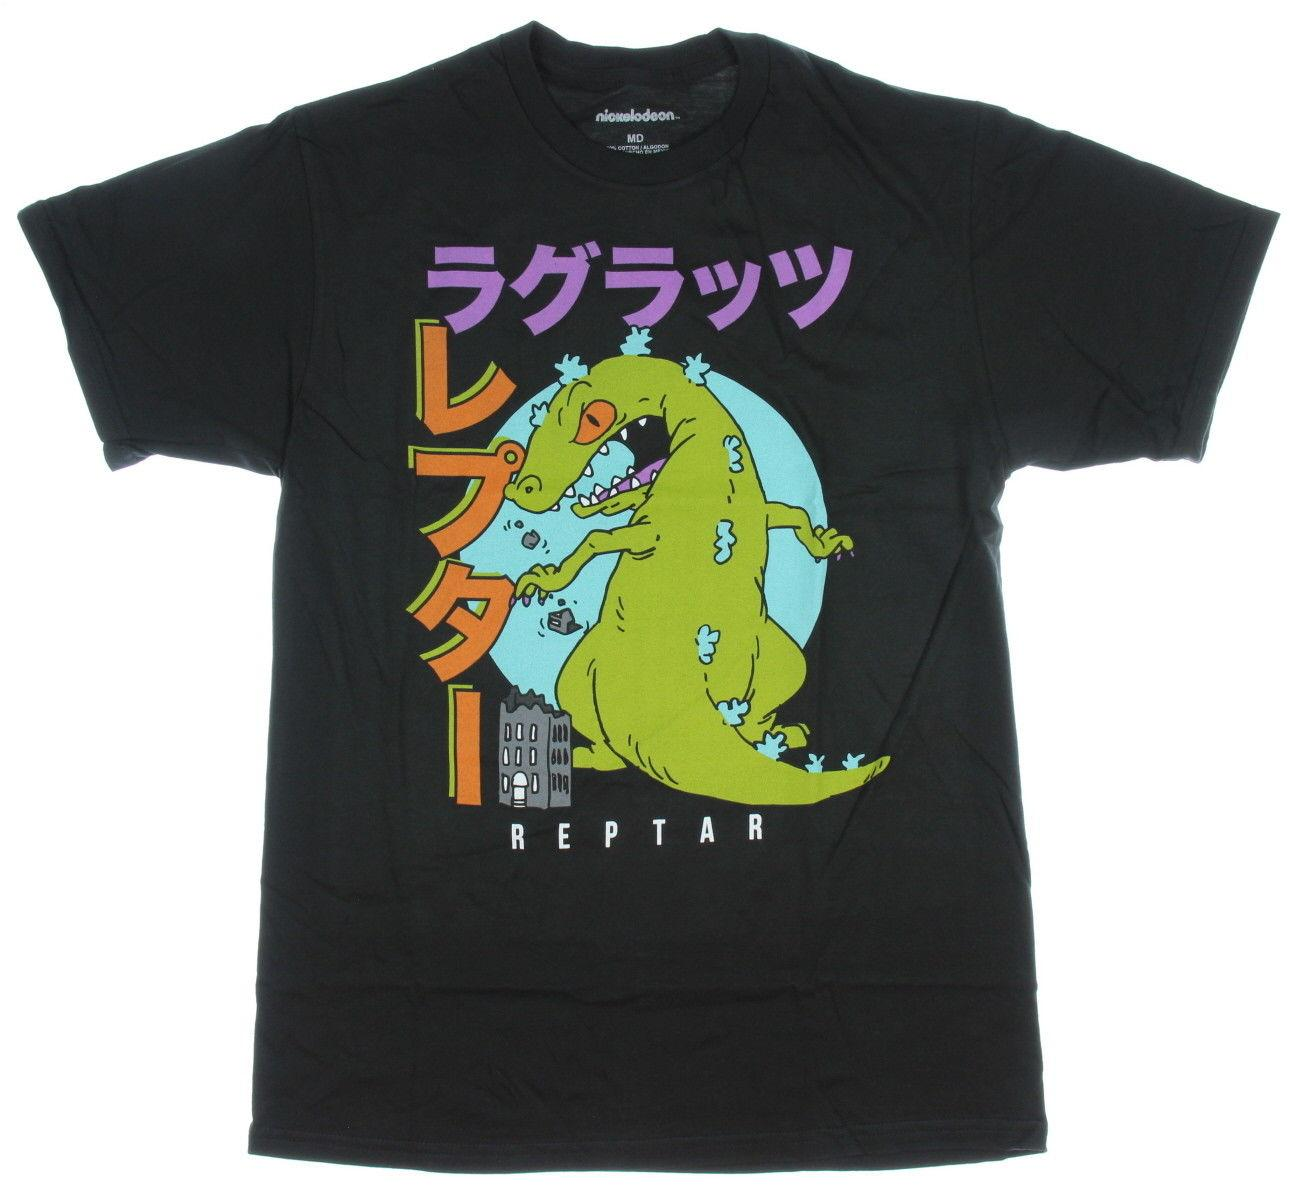 94ad1674e1a Nickelodeon Shirt Rugrats Reptar Japanese Script Men S Graphic T Shirt  Medium T Sirts T Shirs From Caisemao07